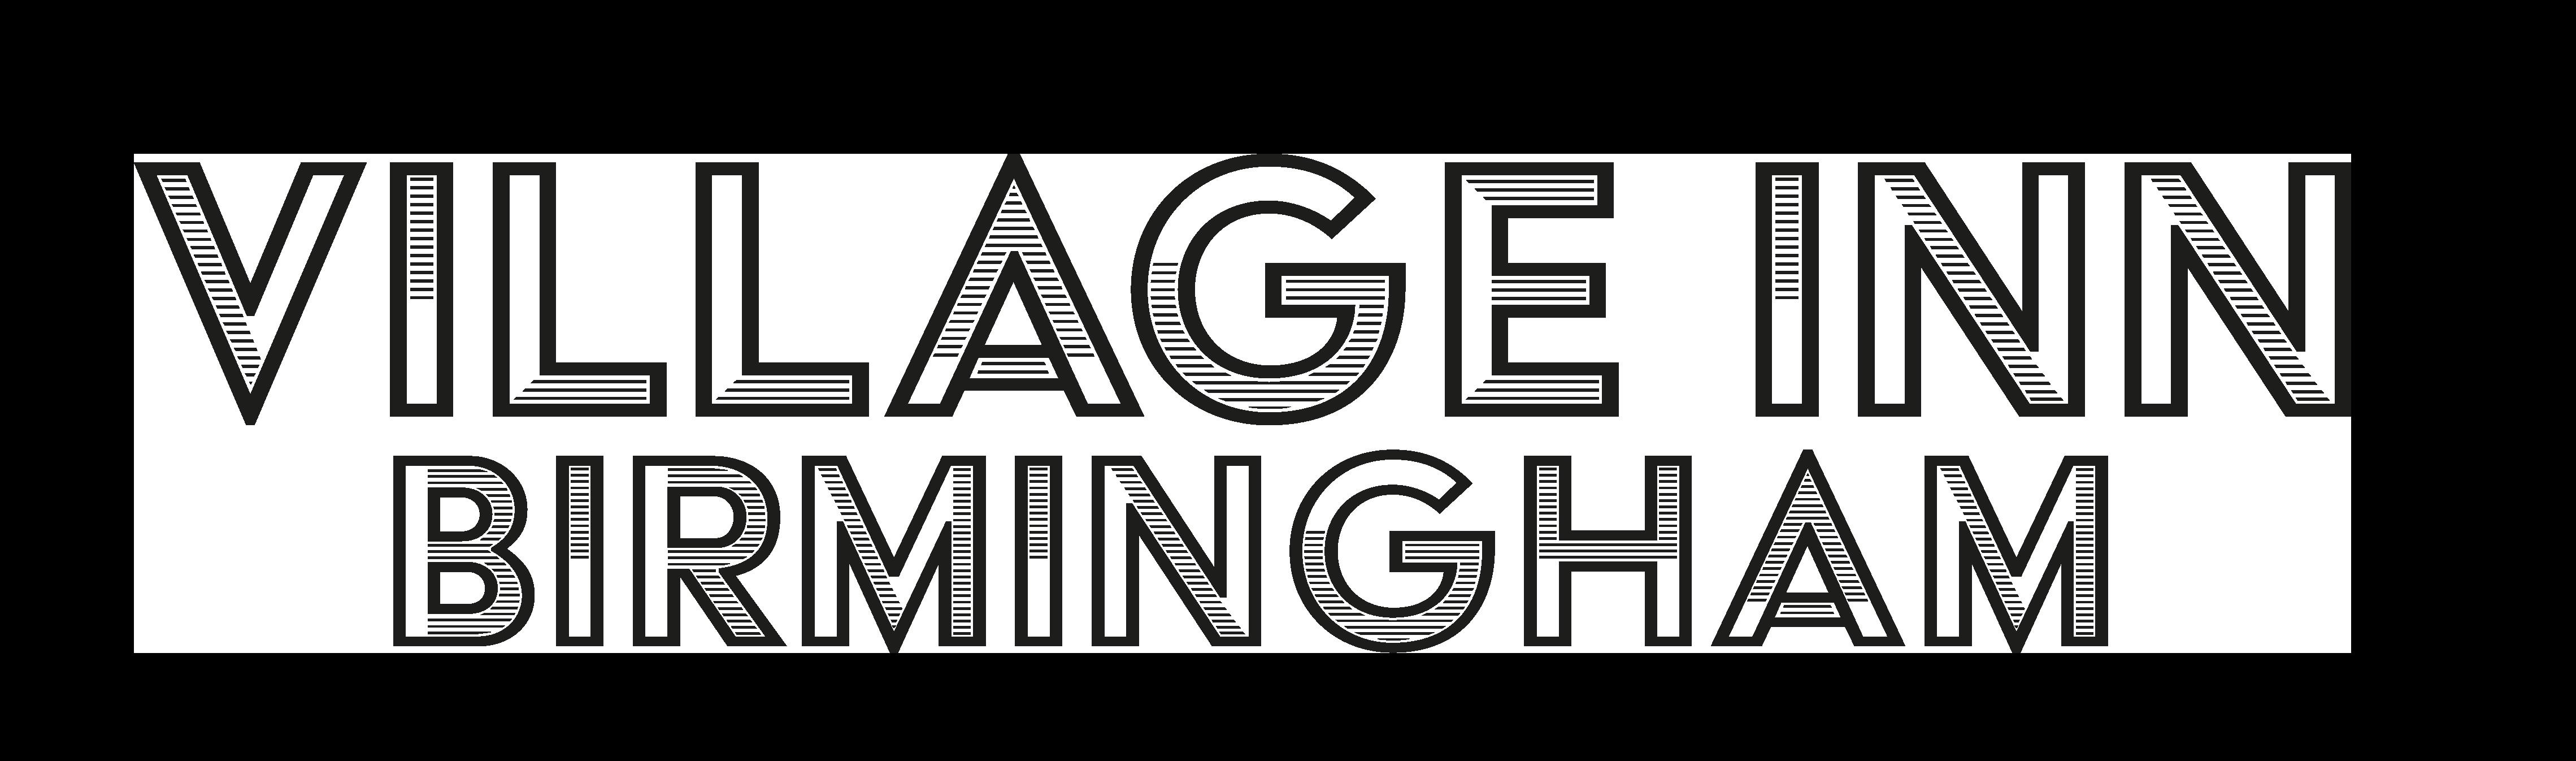 Village Inn Birmingham logo